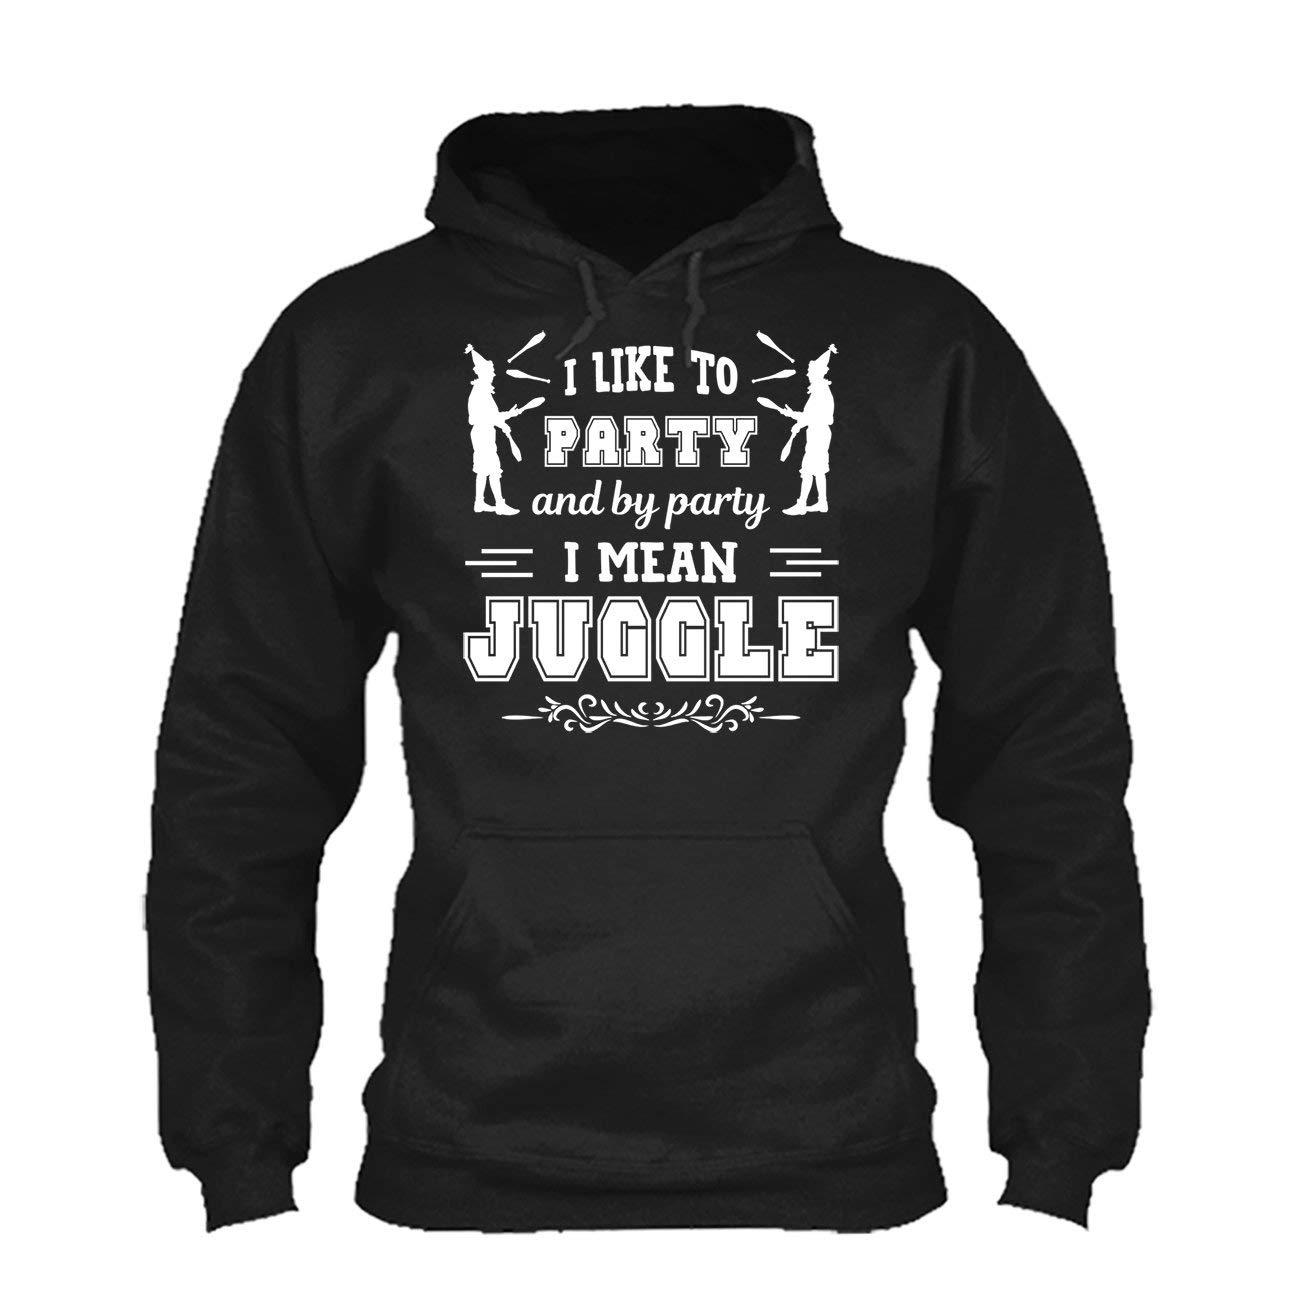 LightRed Cool I Mean Juggling Tshirt Sweatshirt Design